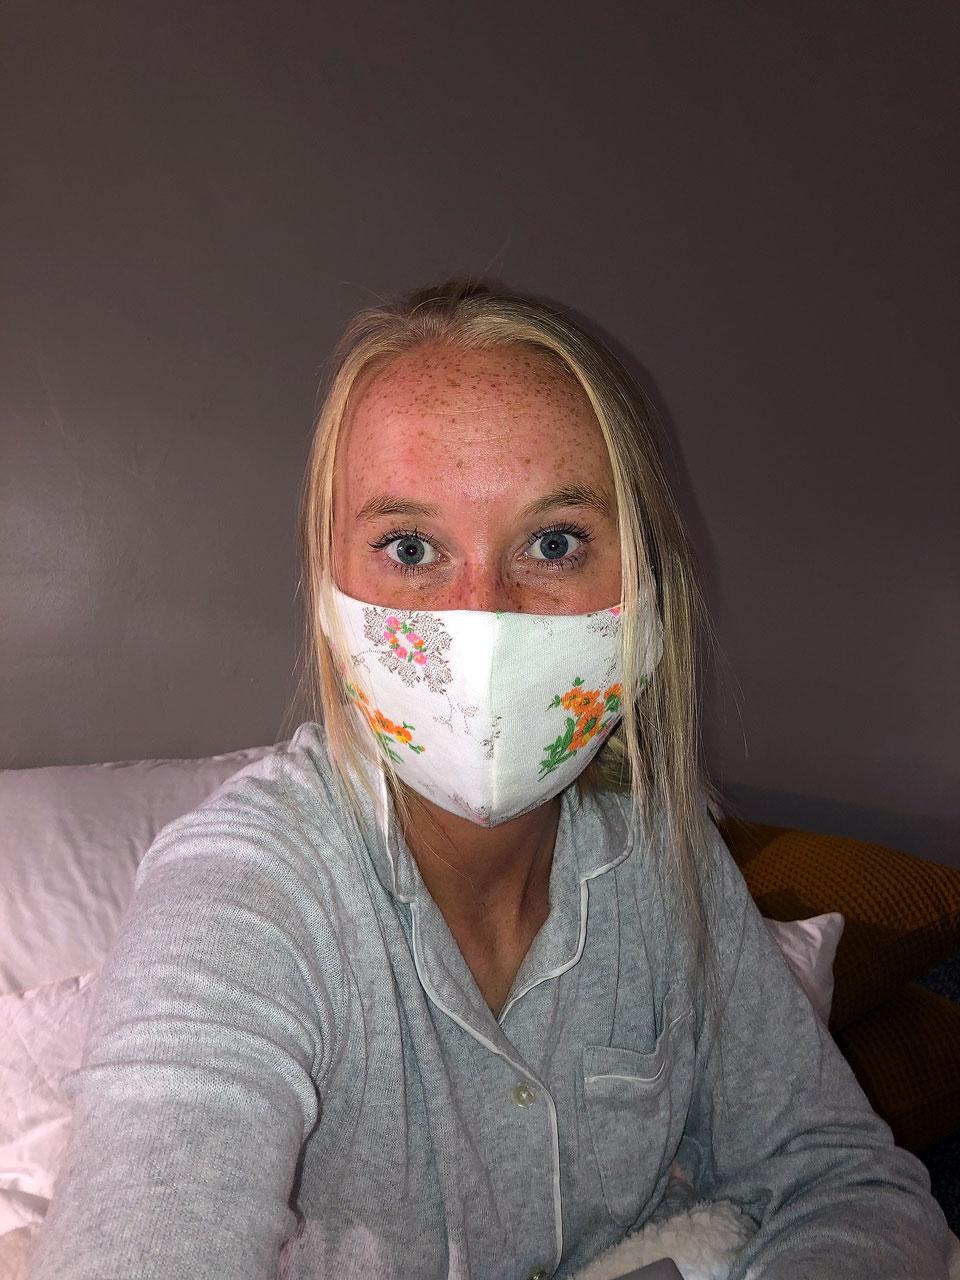 Albany Miller shares a mask selfie